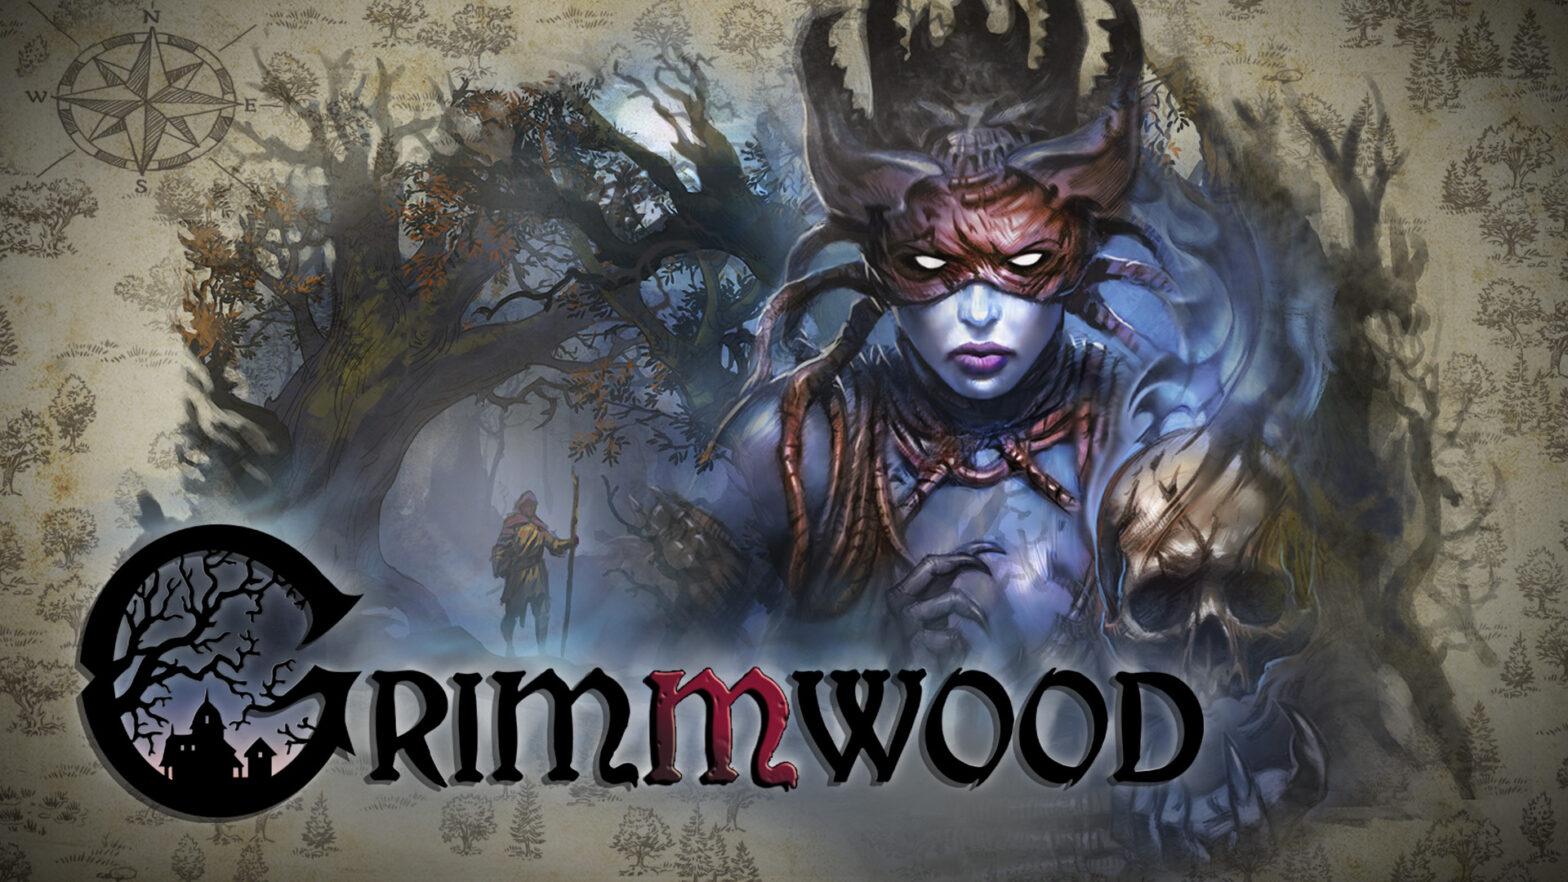 Grimmwood erscheint am 2. August